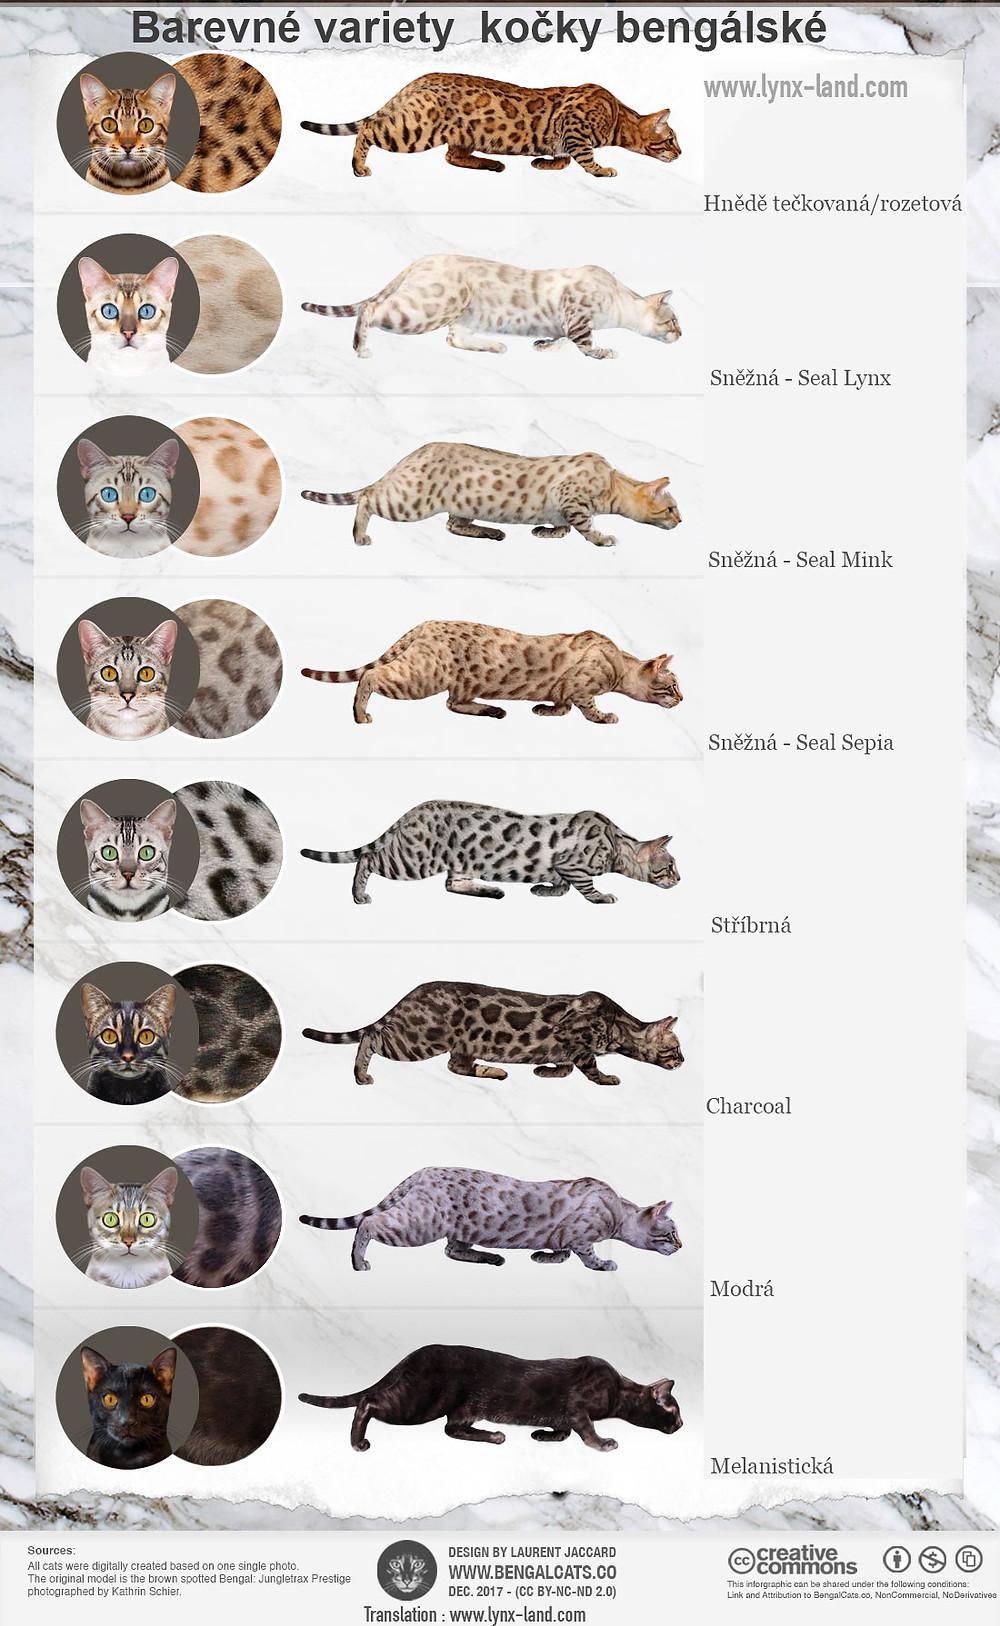 Kočka bengálská – barevné varianty